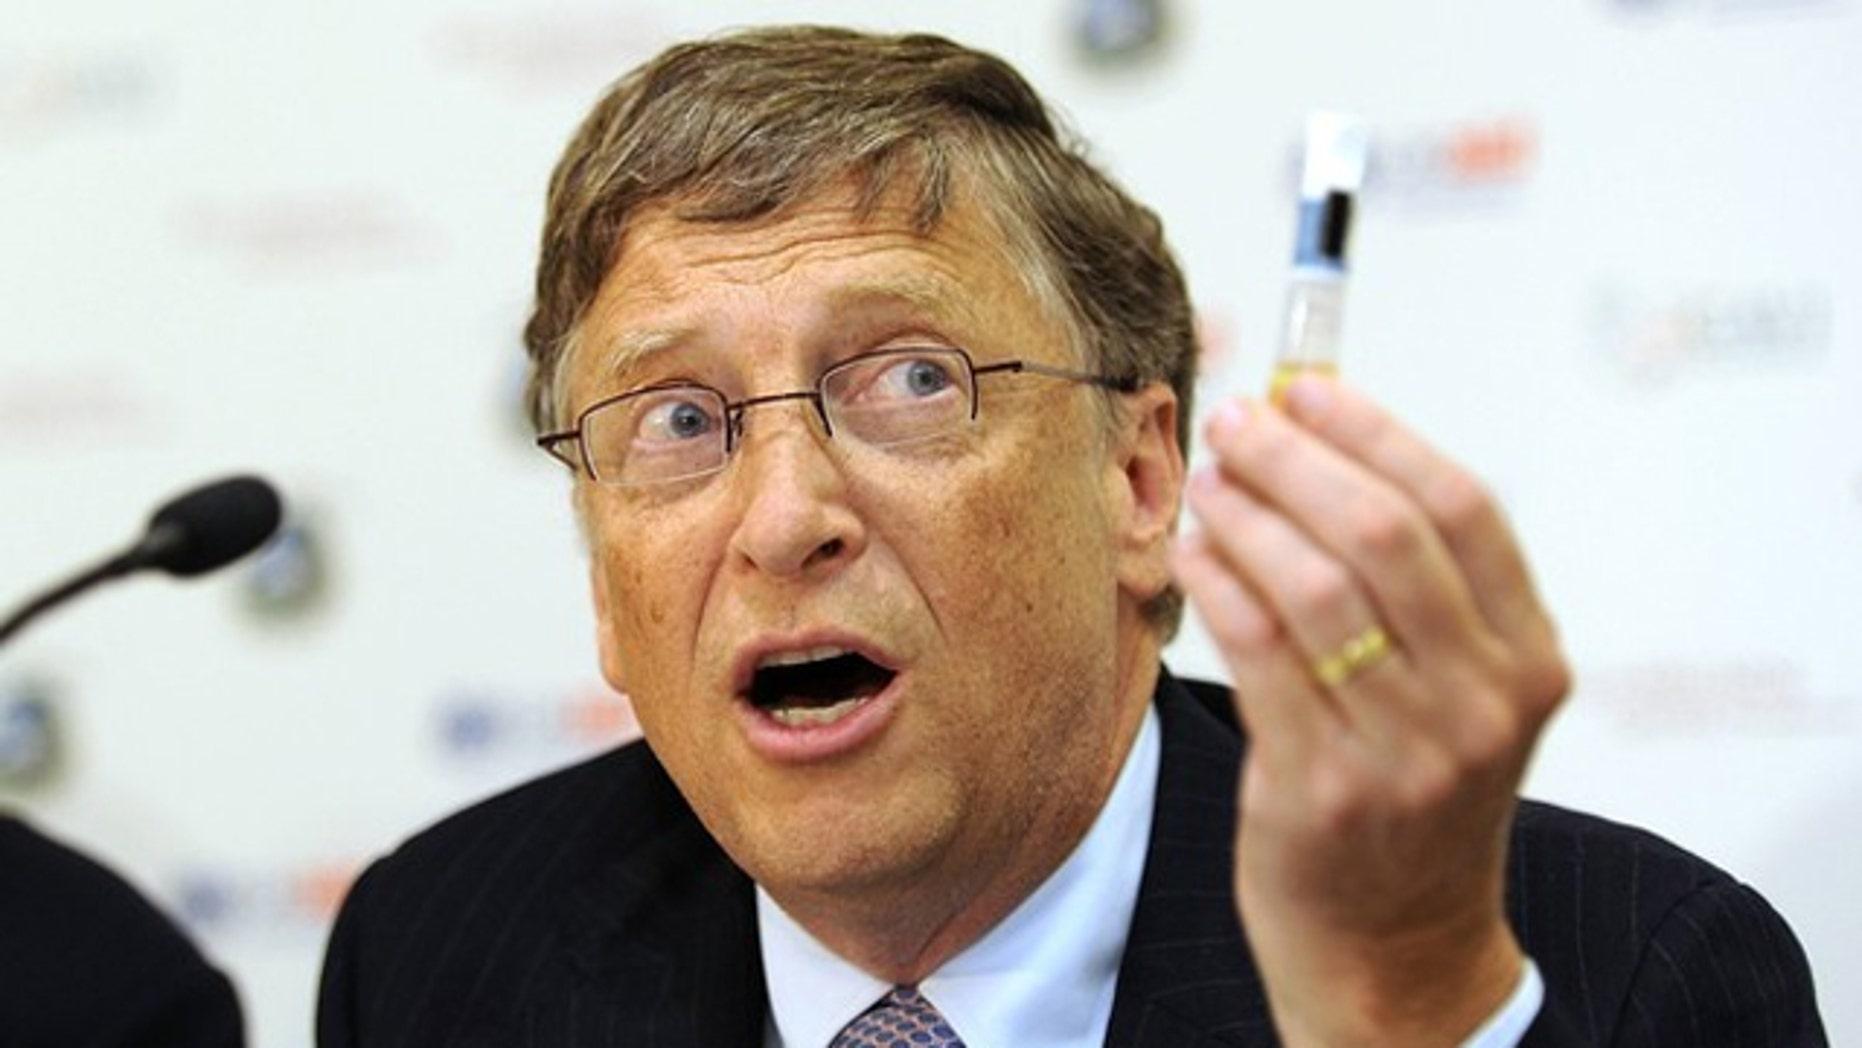 Microsoft founder Bill Gates will testify as a defense witness in a mammoth, $1 billion anti-trust lawsuit.